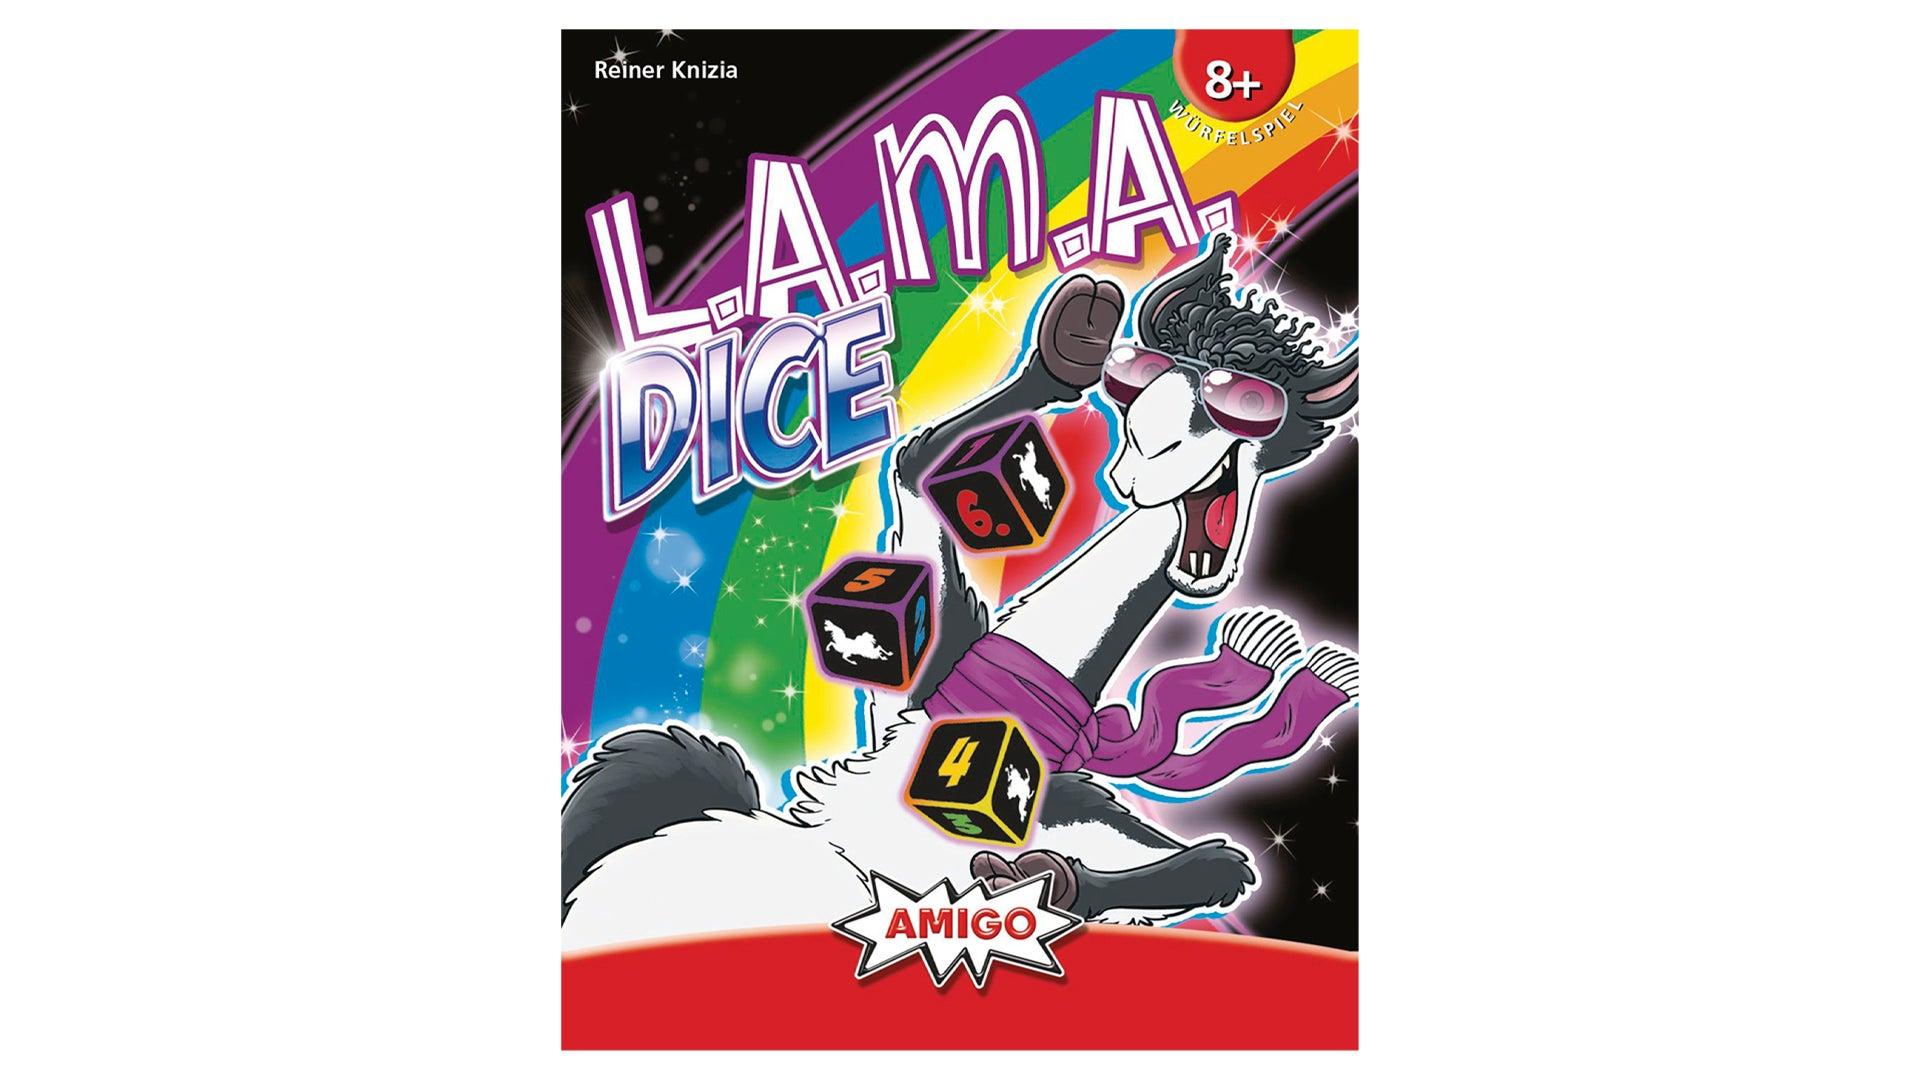 Lama Dice artwork 2